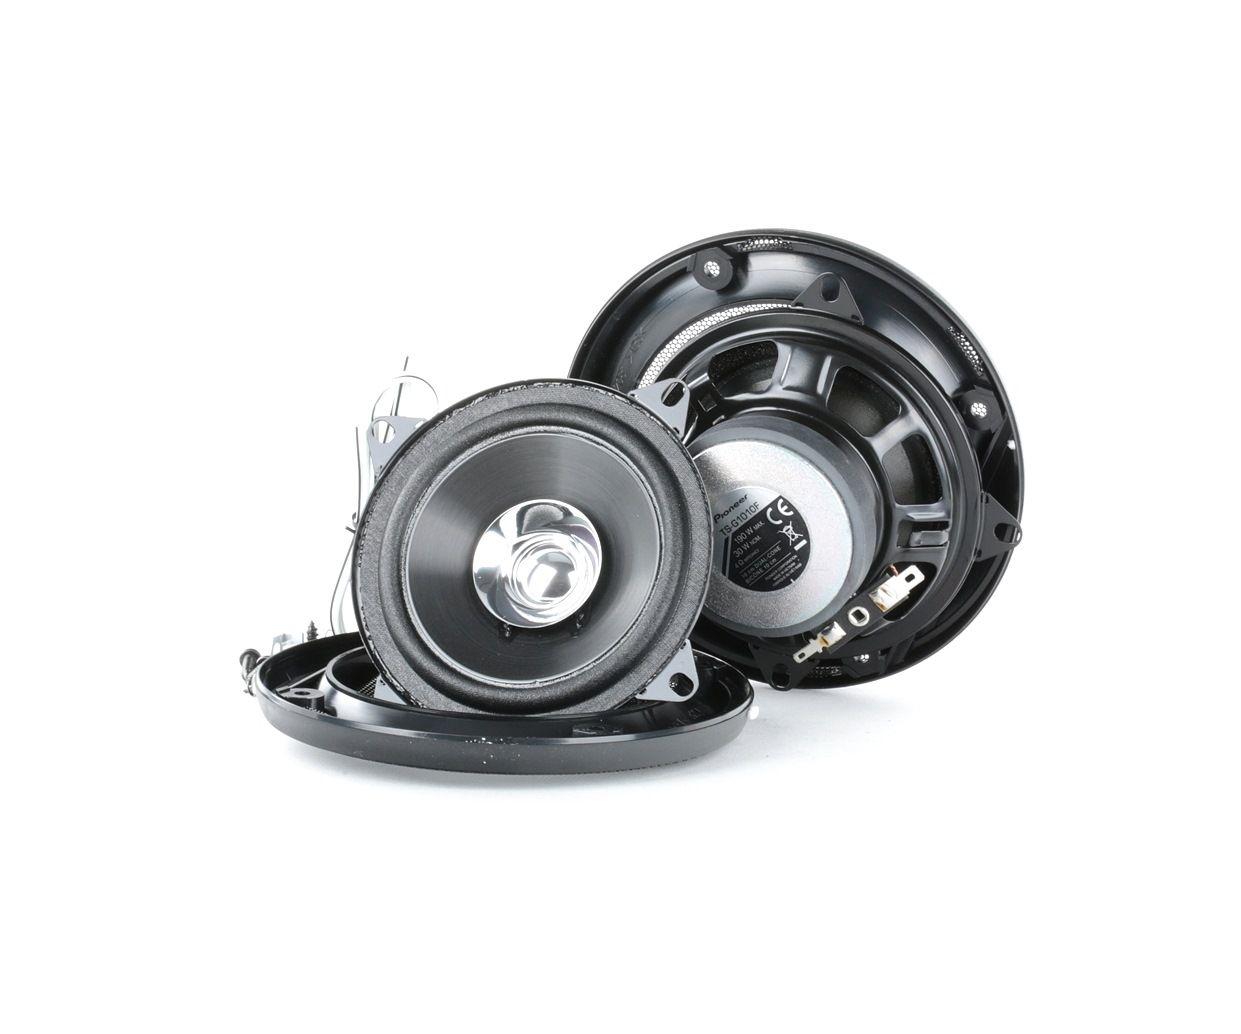 Lautsprecher TS-G1010F Niedrige Preise - Jetzt kaufen!